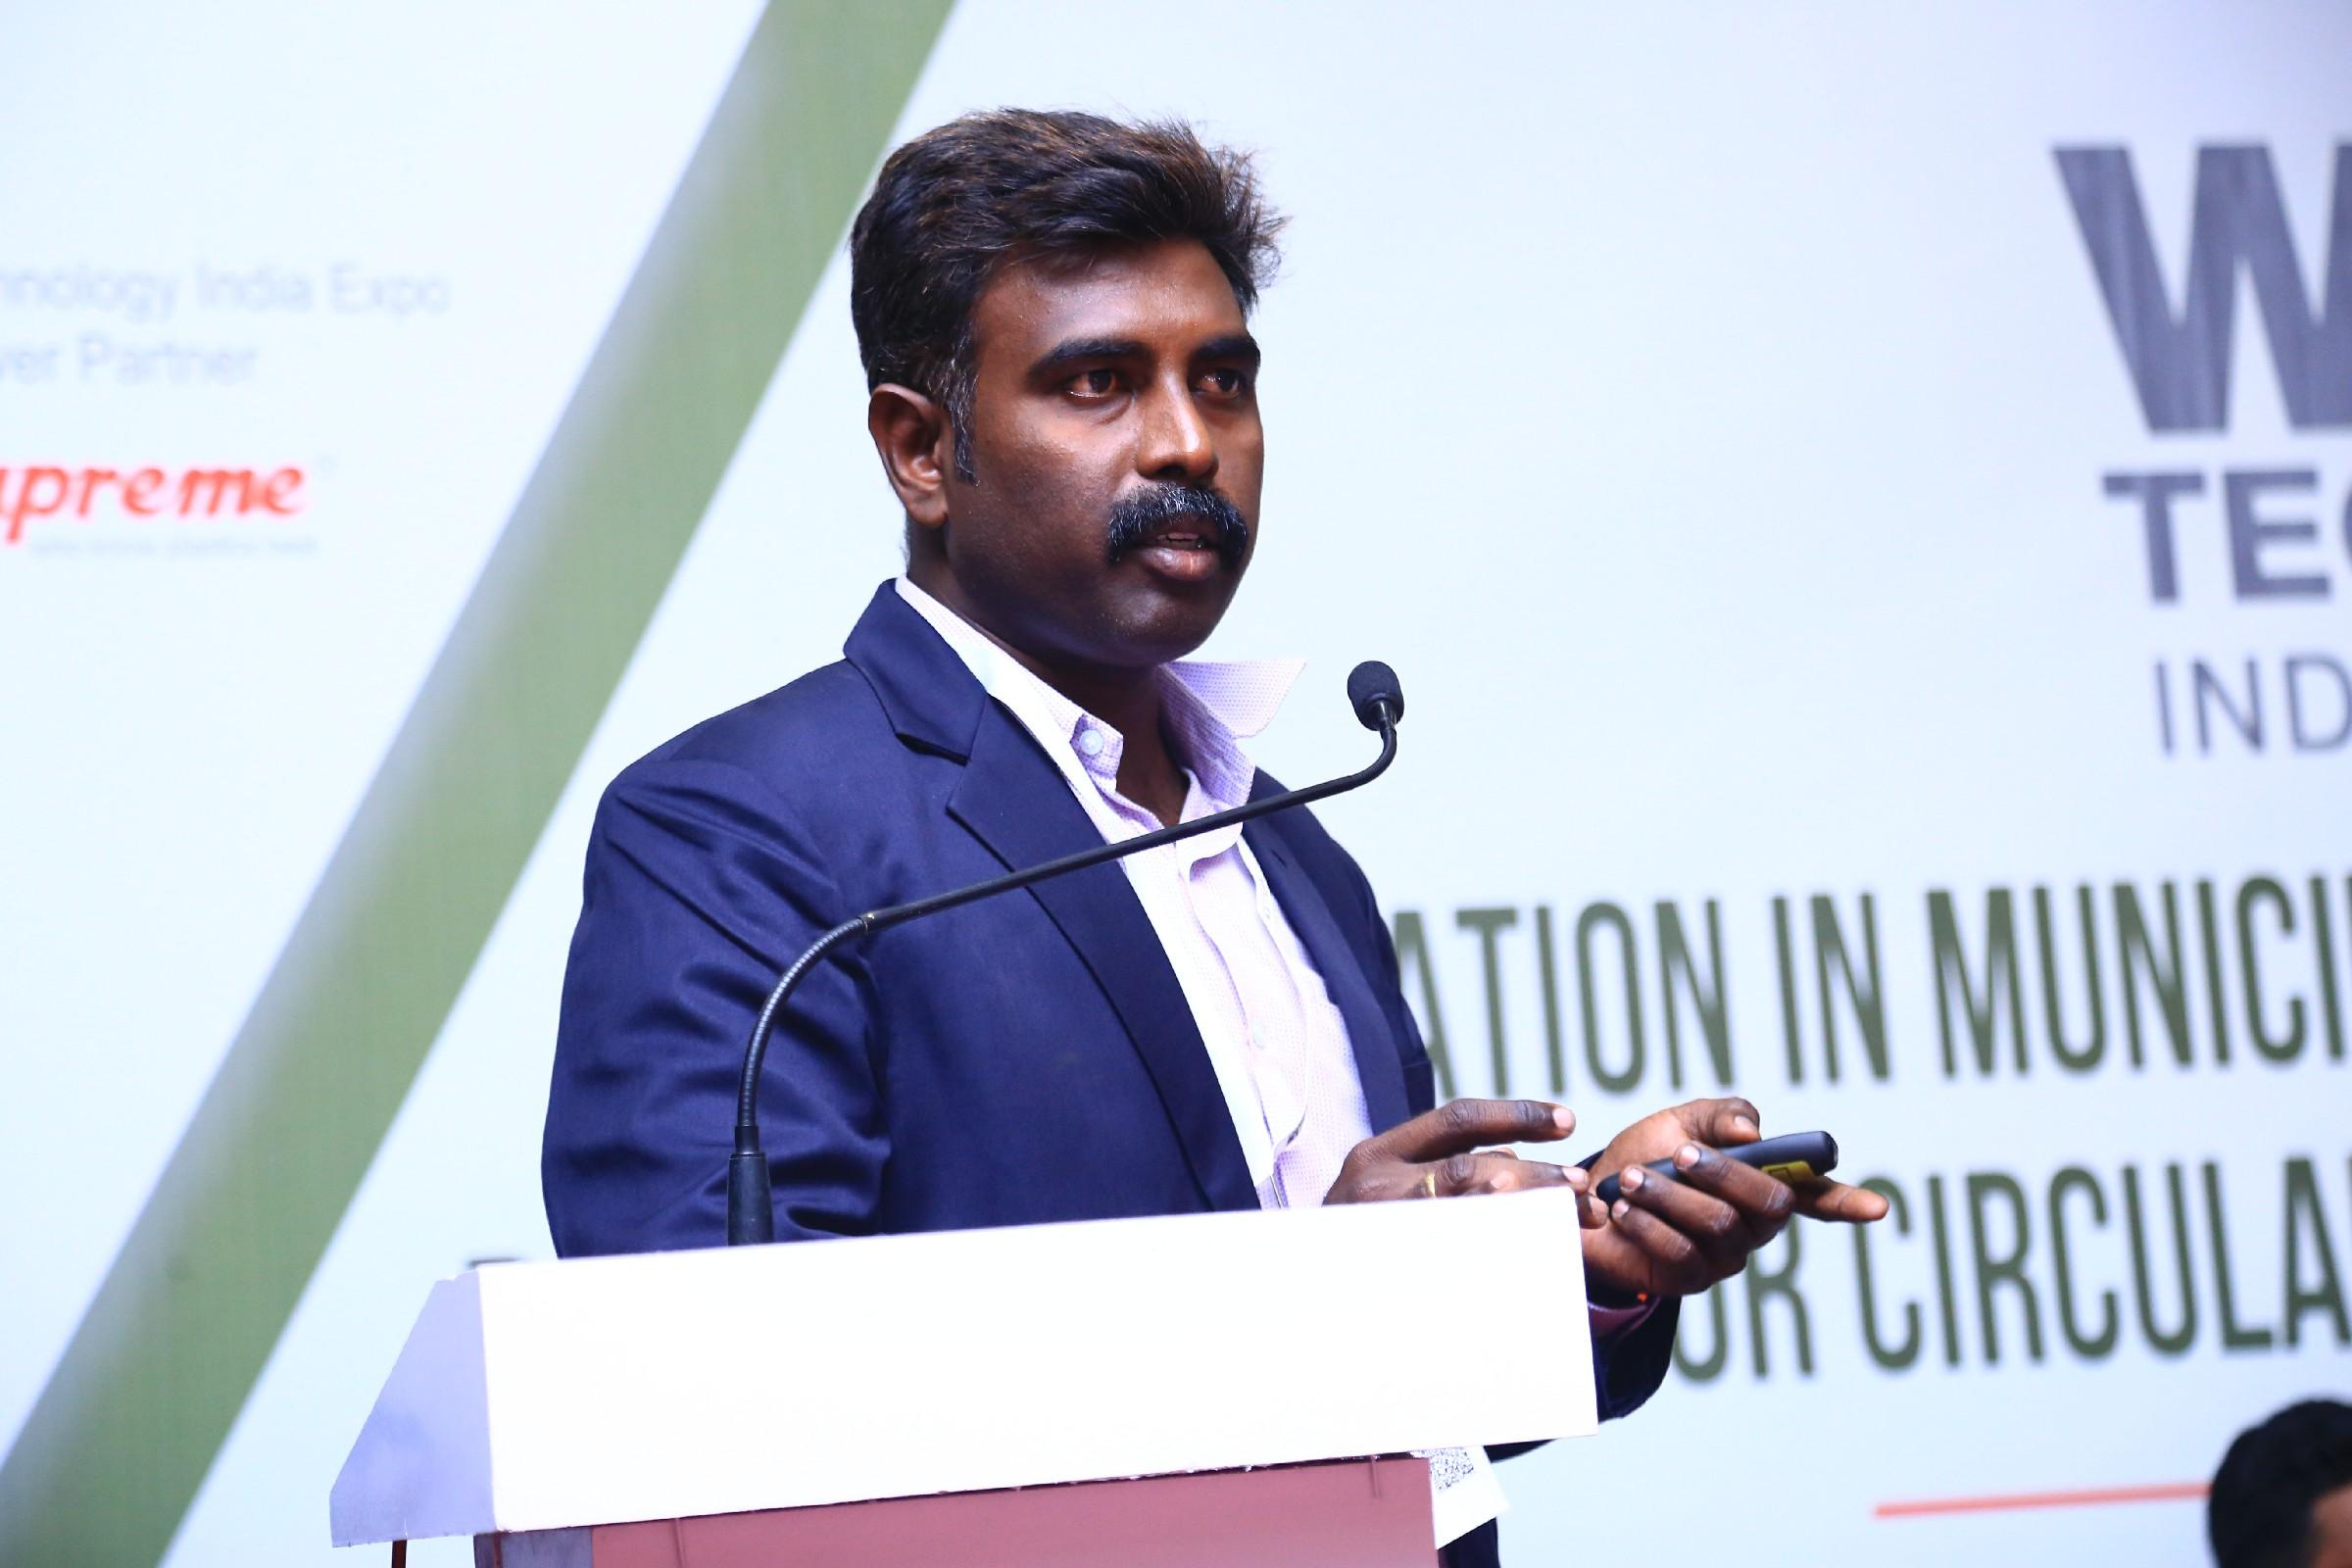 K.Samson-Daniel-Assistant-Manager-GÇô-Instrumentation-at-AGEC-Chennai-23